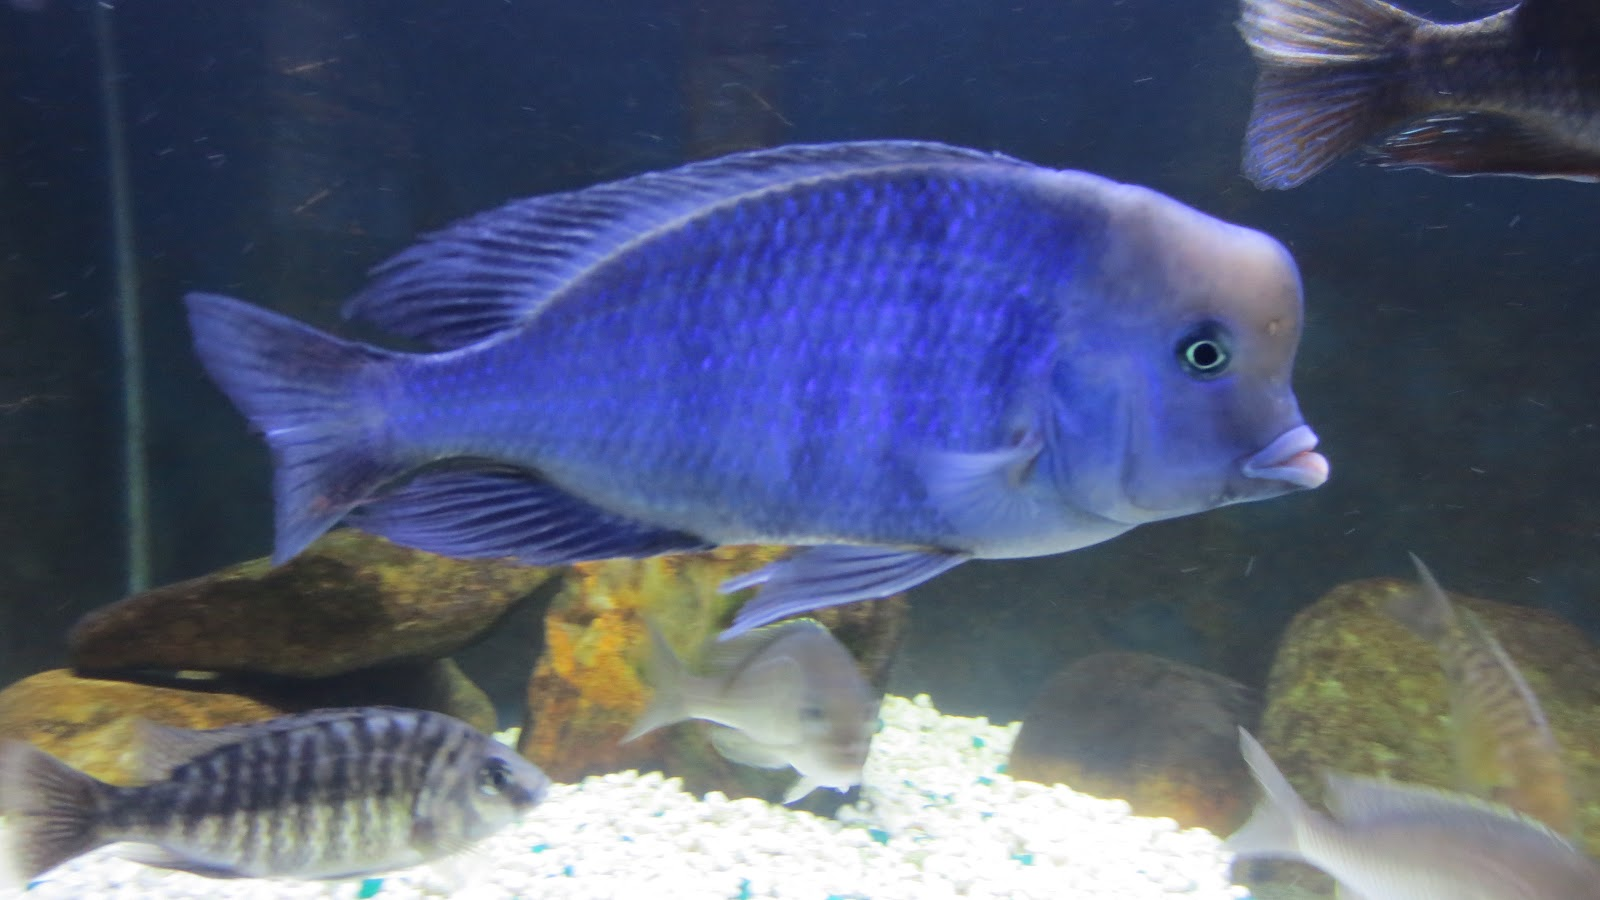 mal/tang fish: Cyrtocara moorii Blue Dolphin, 11-23-12